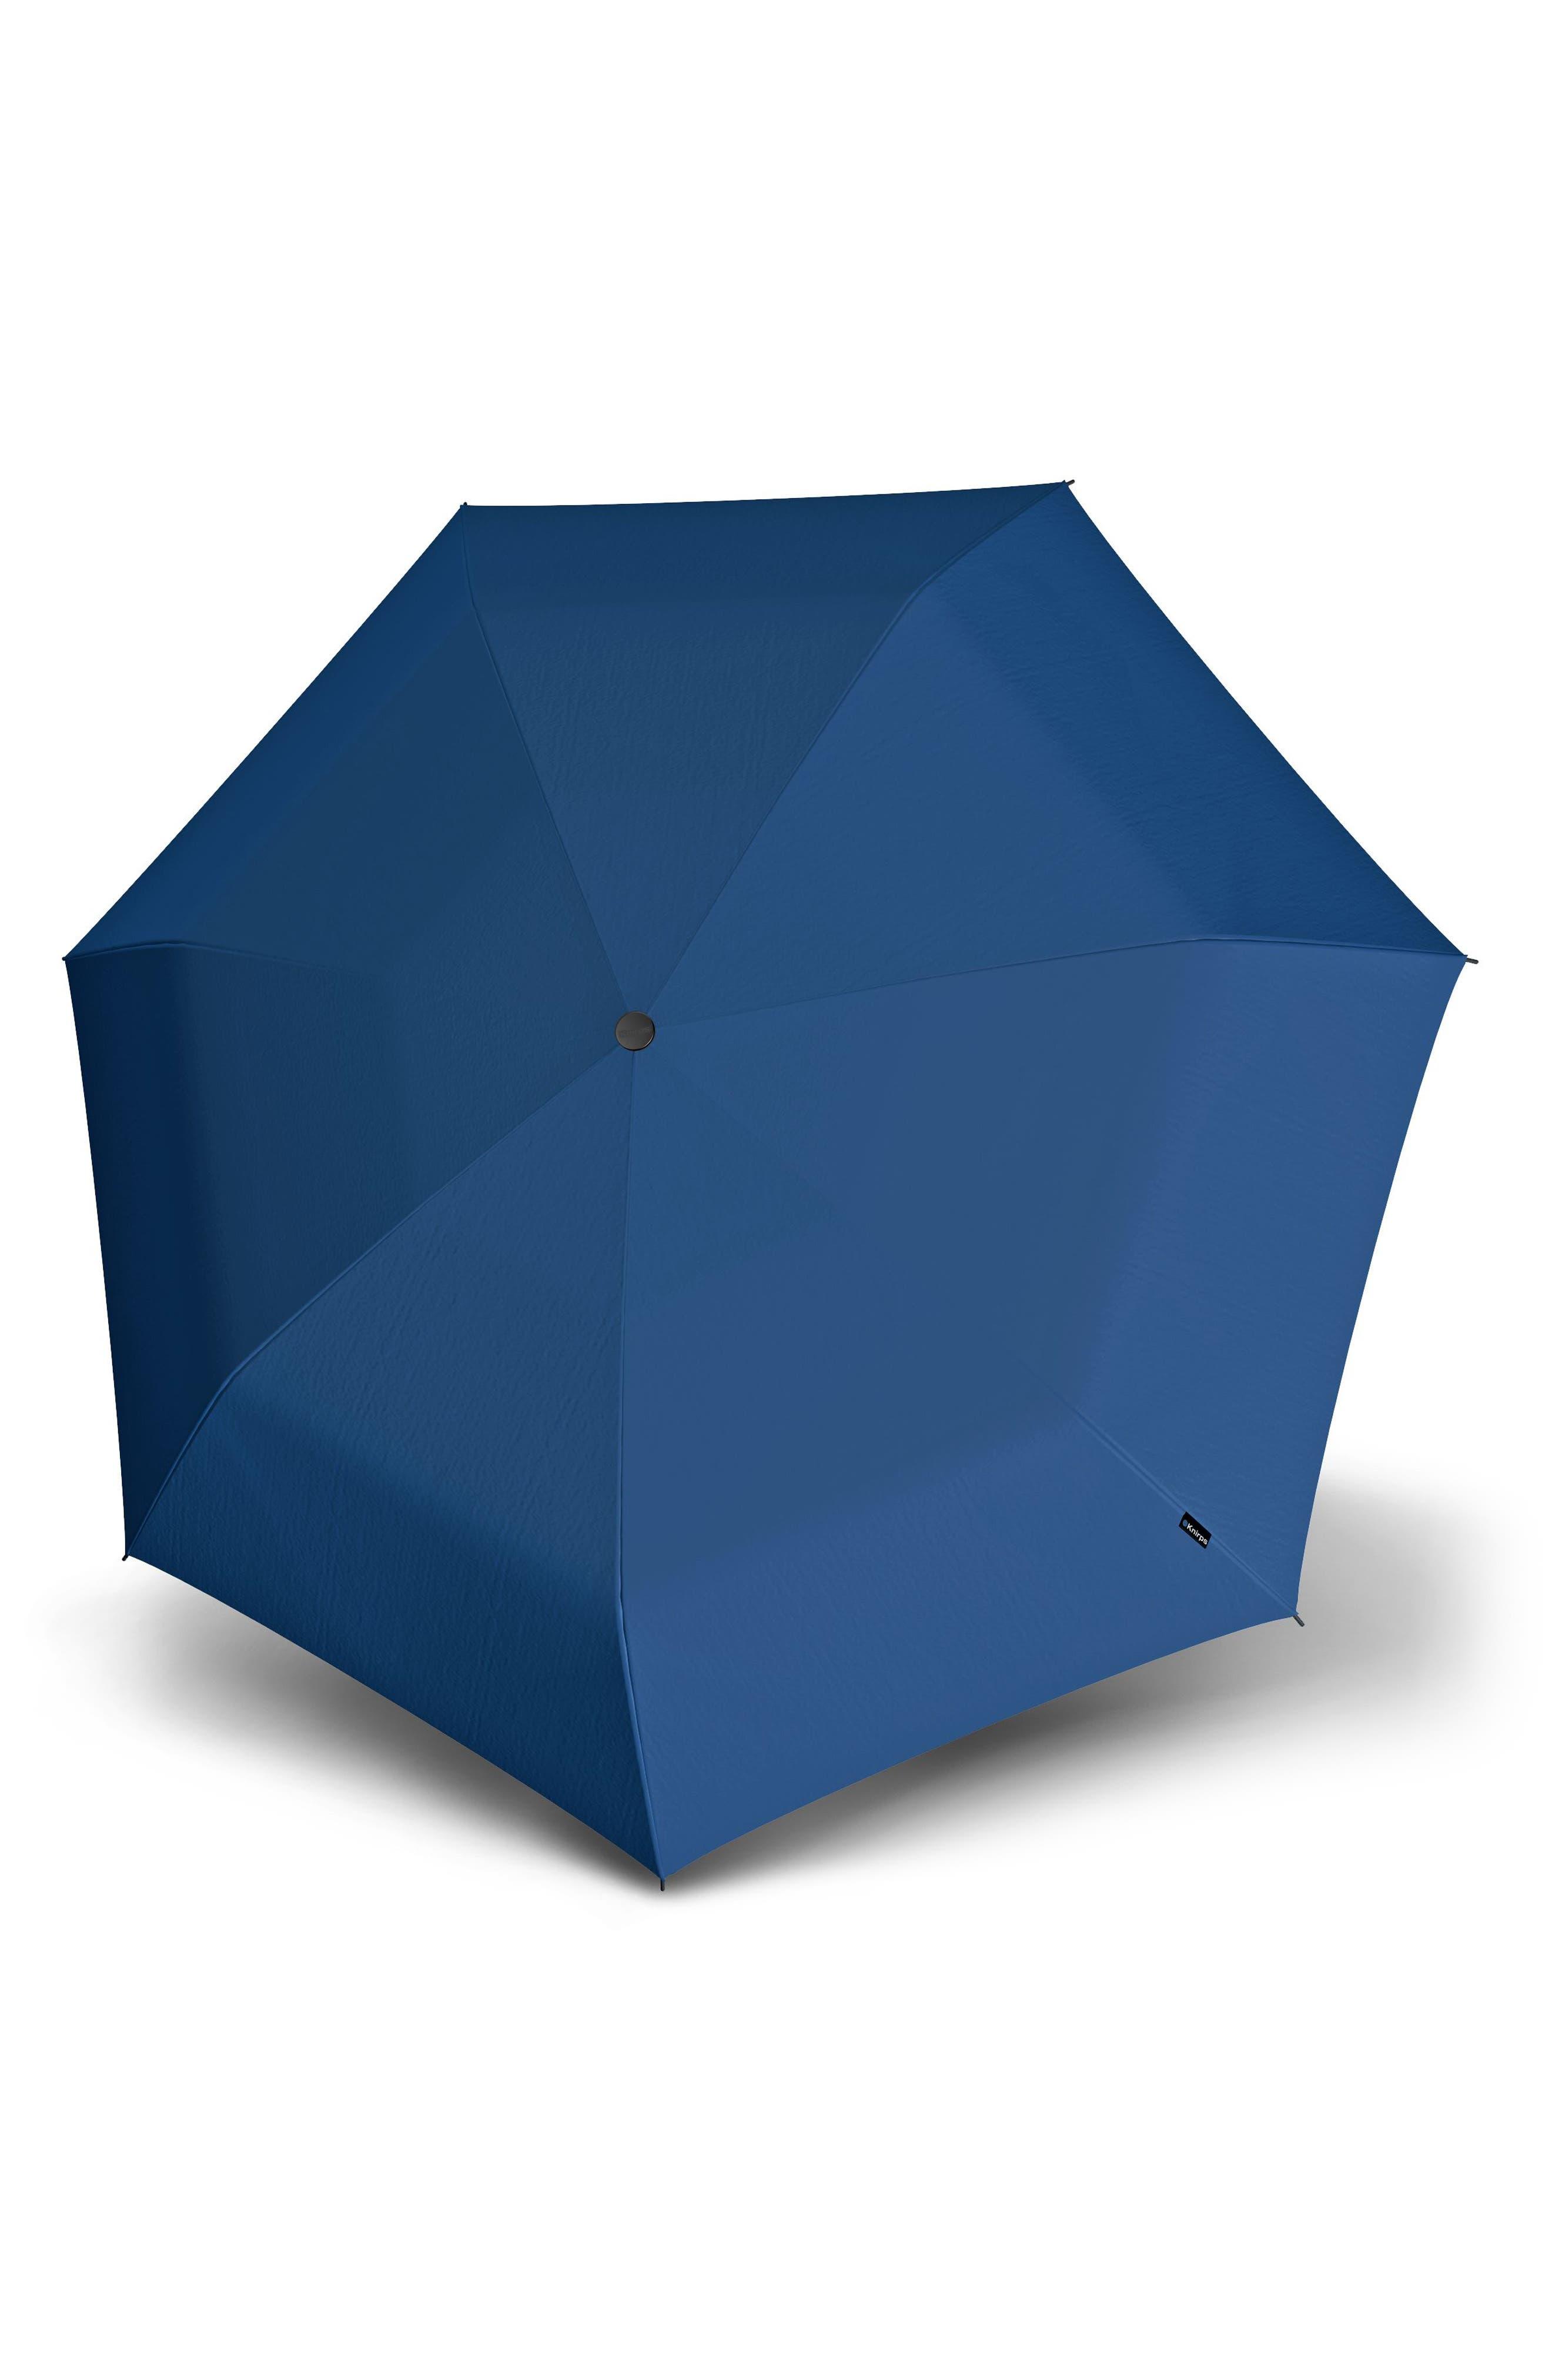 Main Image - Knirps T2 Duomatic Compact Auto Open/Close Umbrella